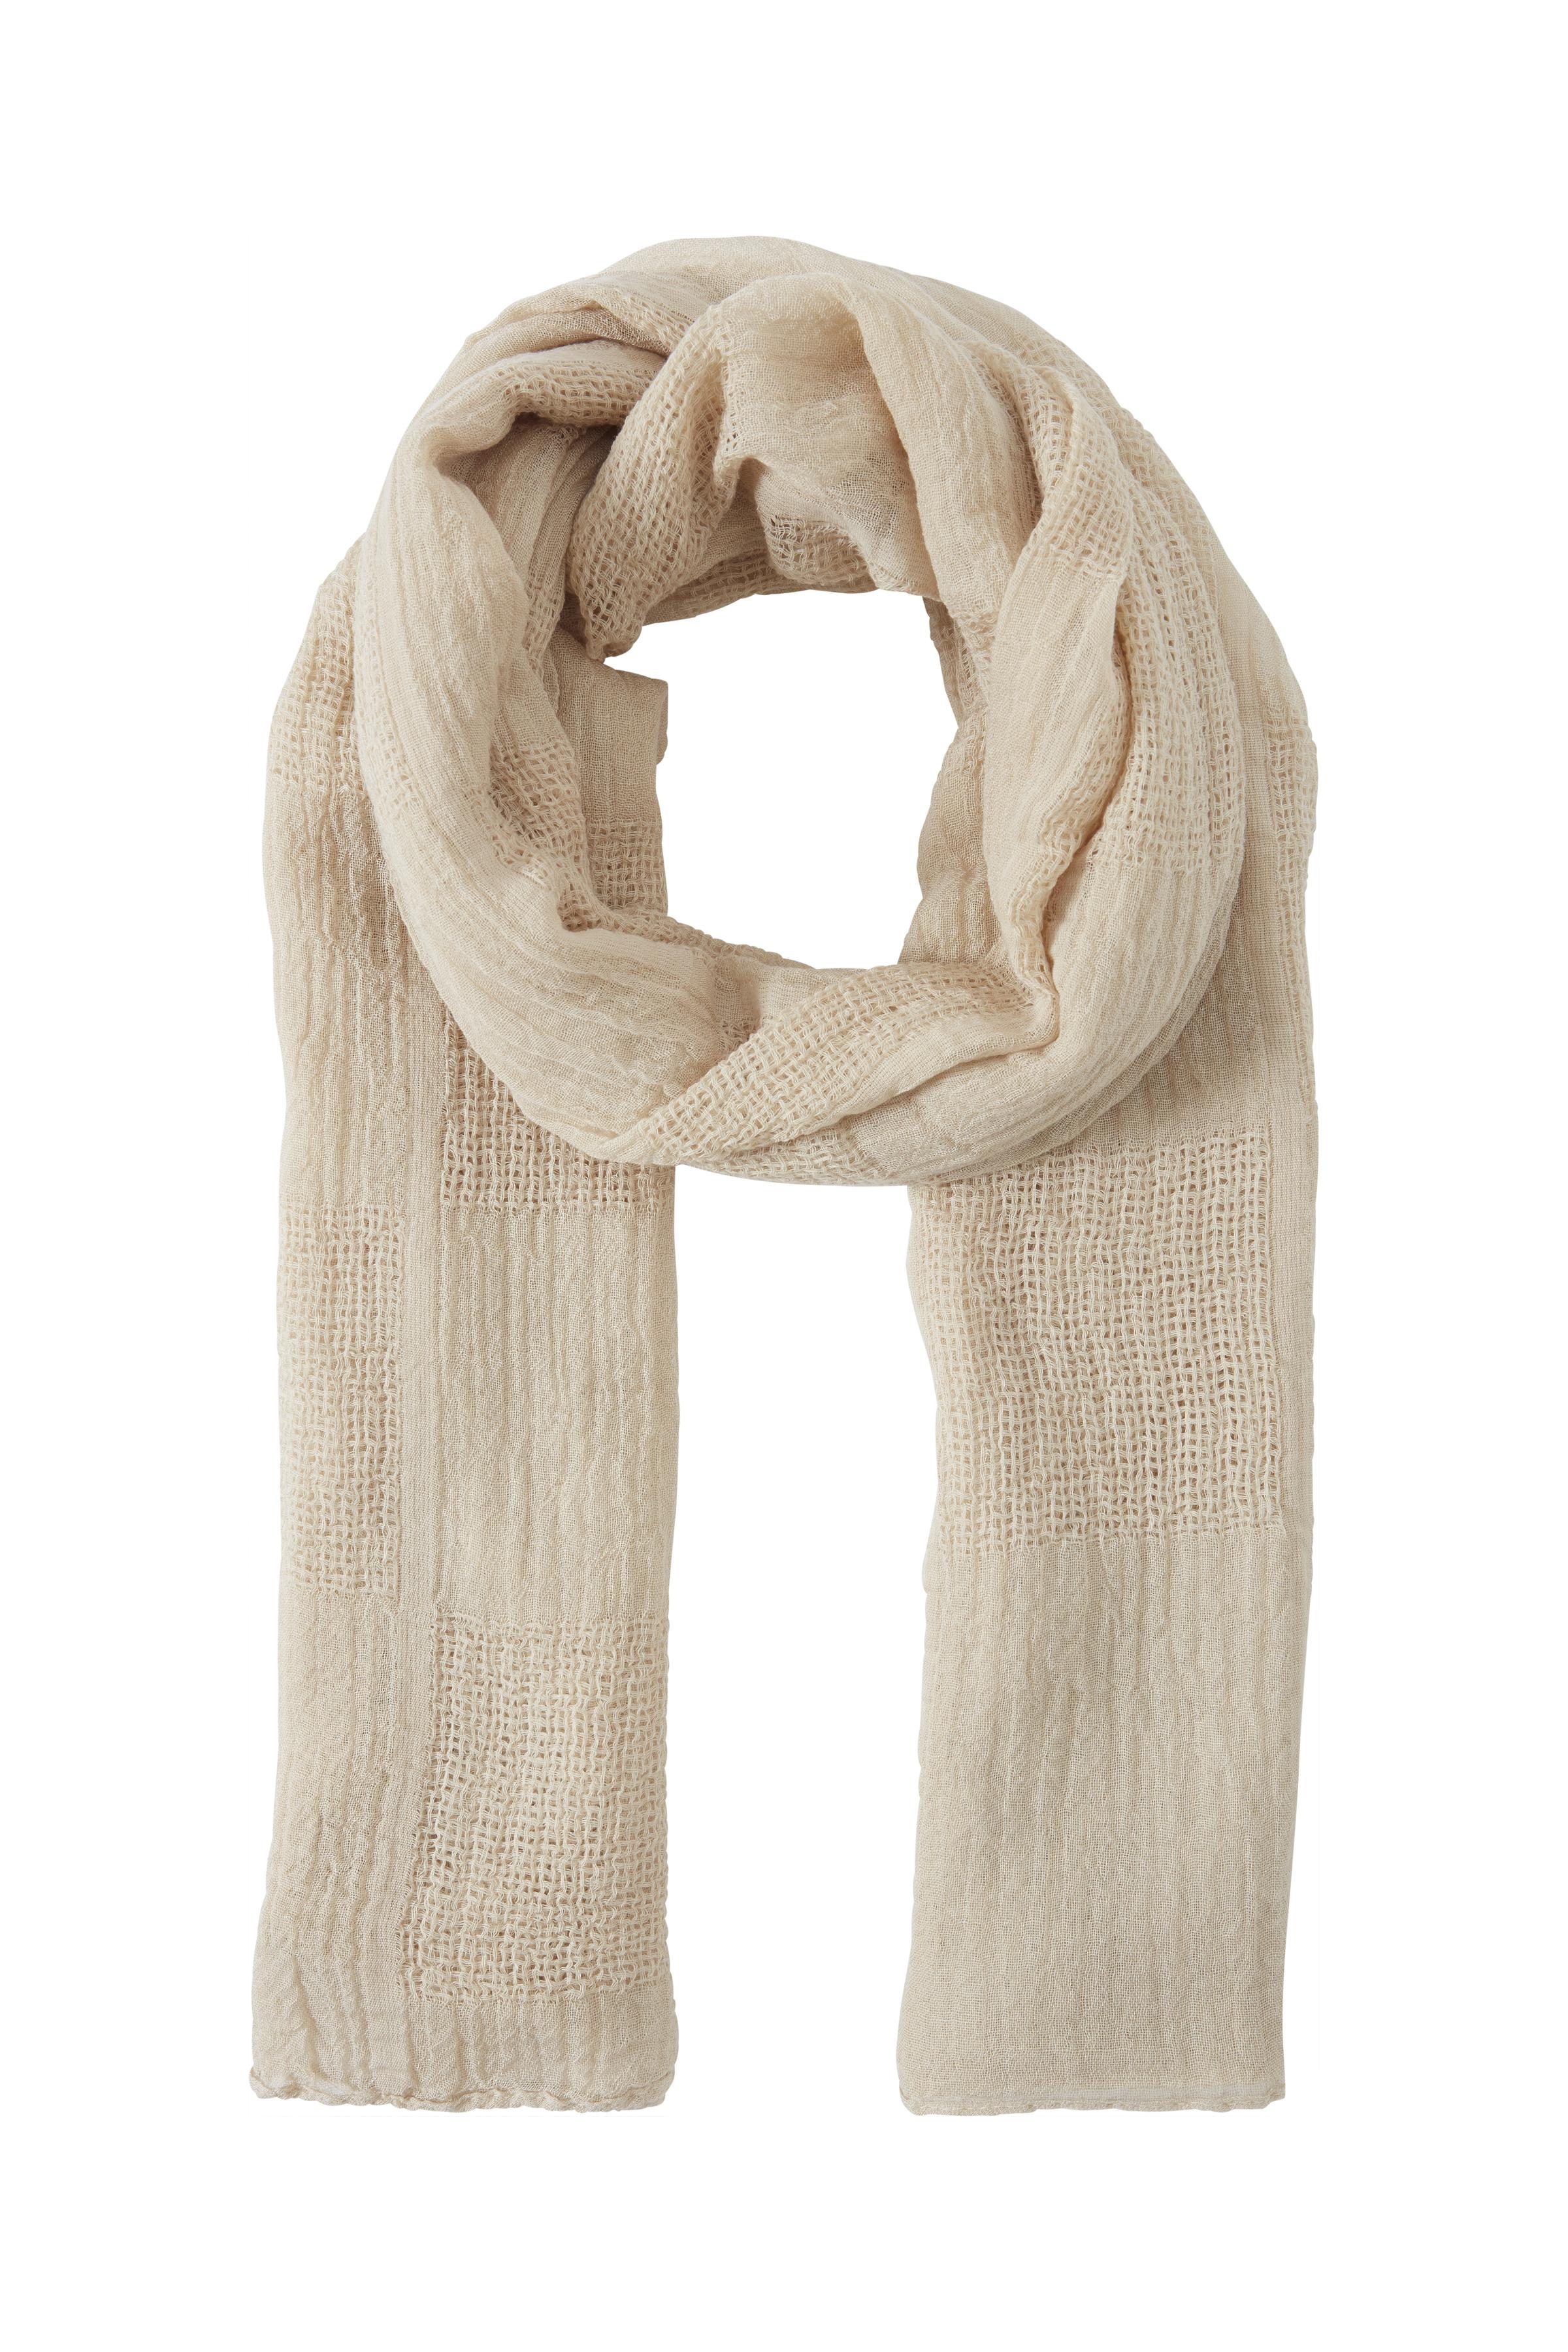 Image of   Ichi - accessories Dame Tørklæde - Sand